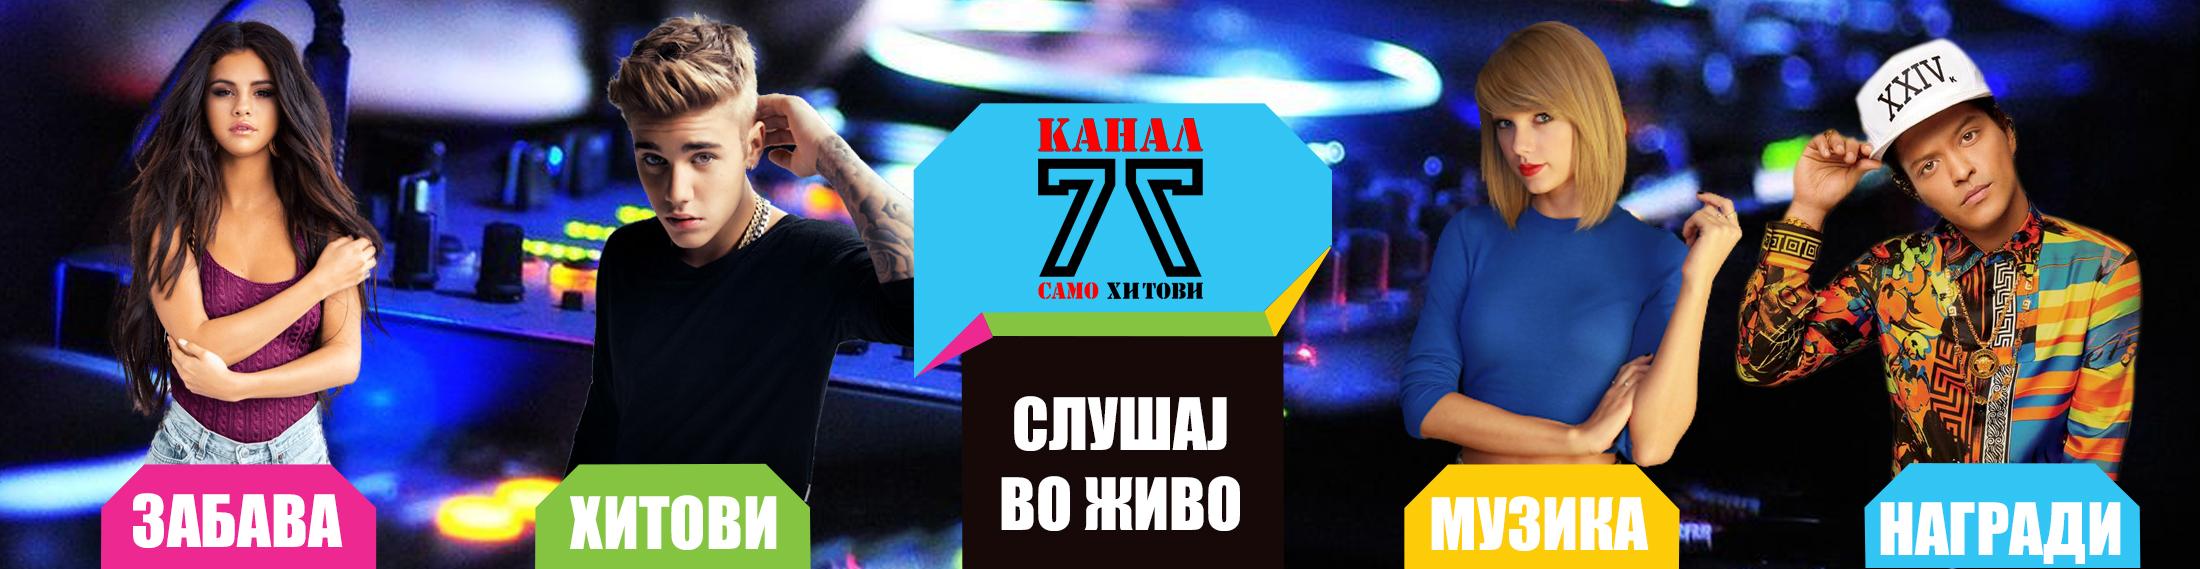 Банер за Радио